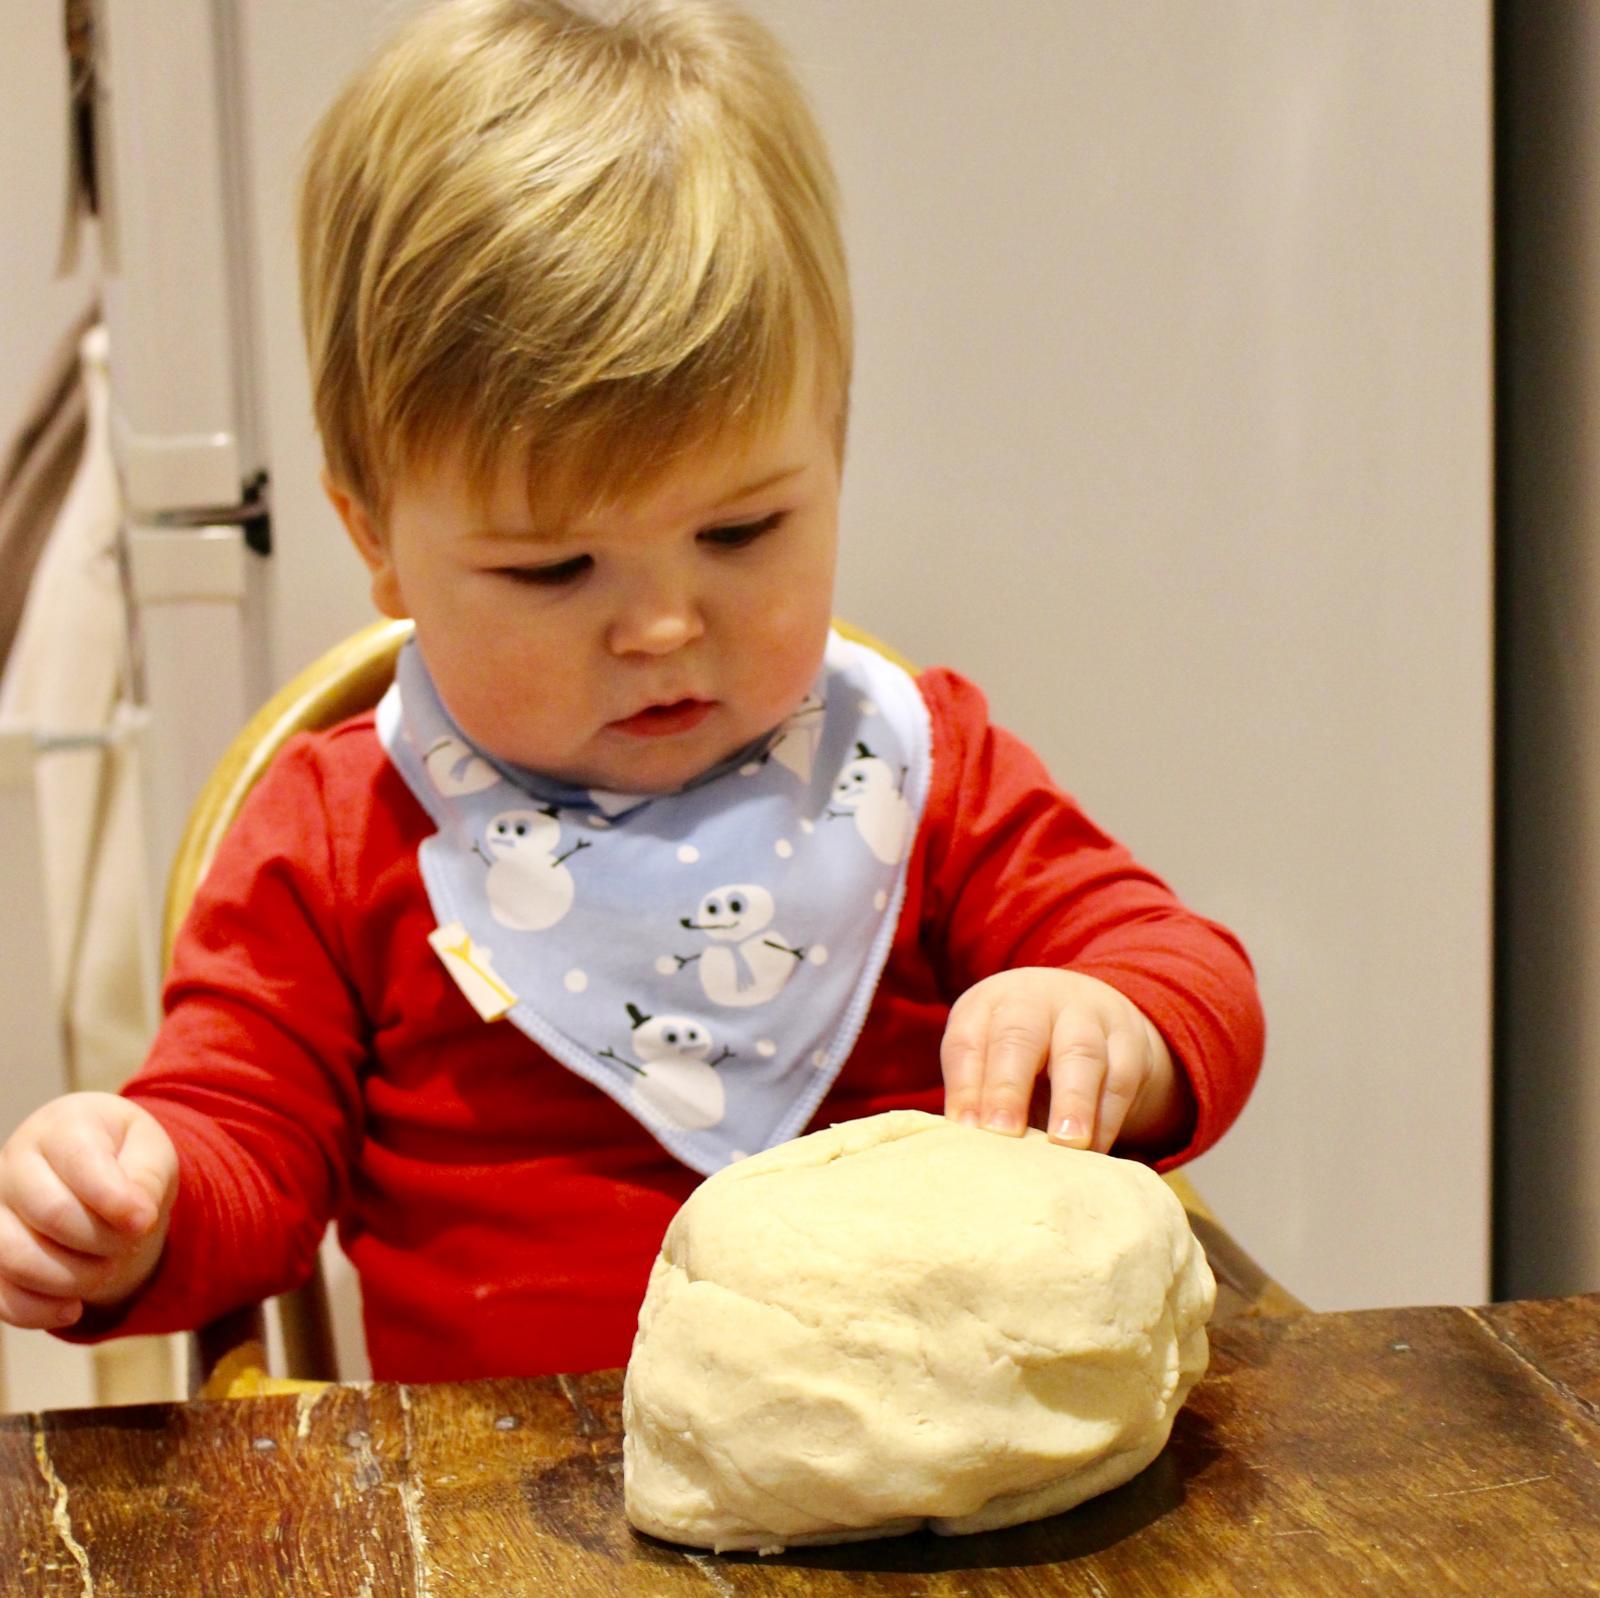 Salt Dough Handprint Decorations - the perfect dough